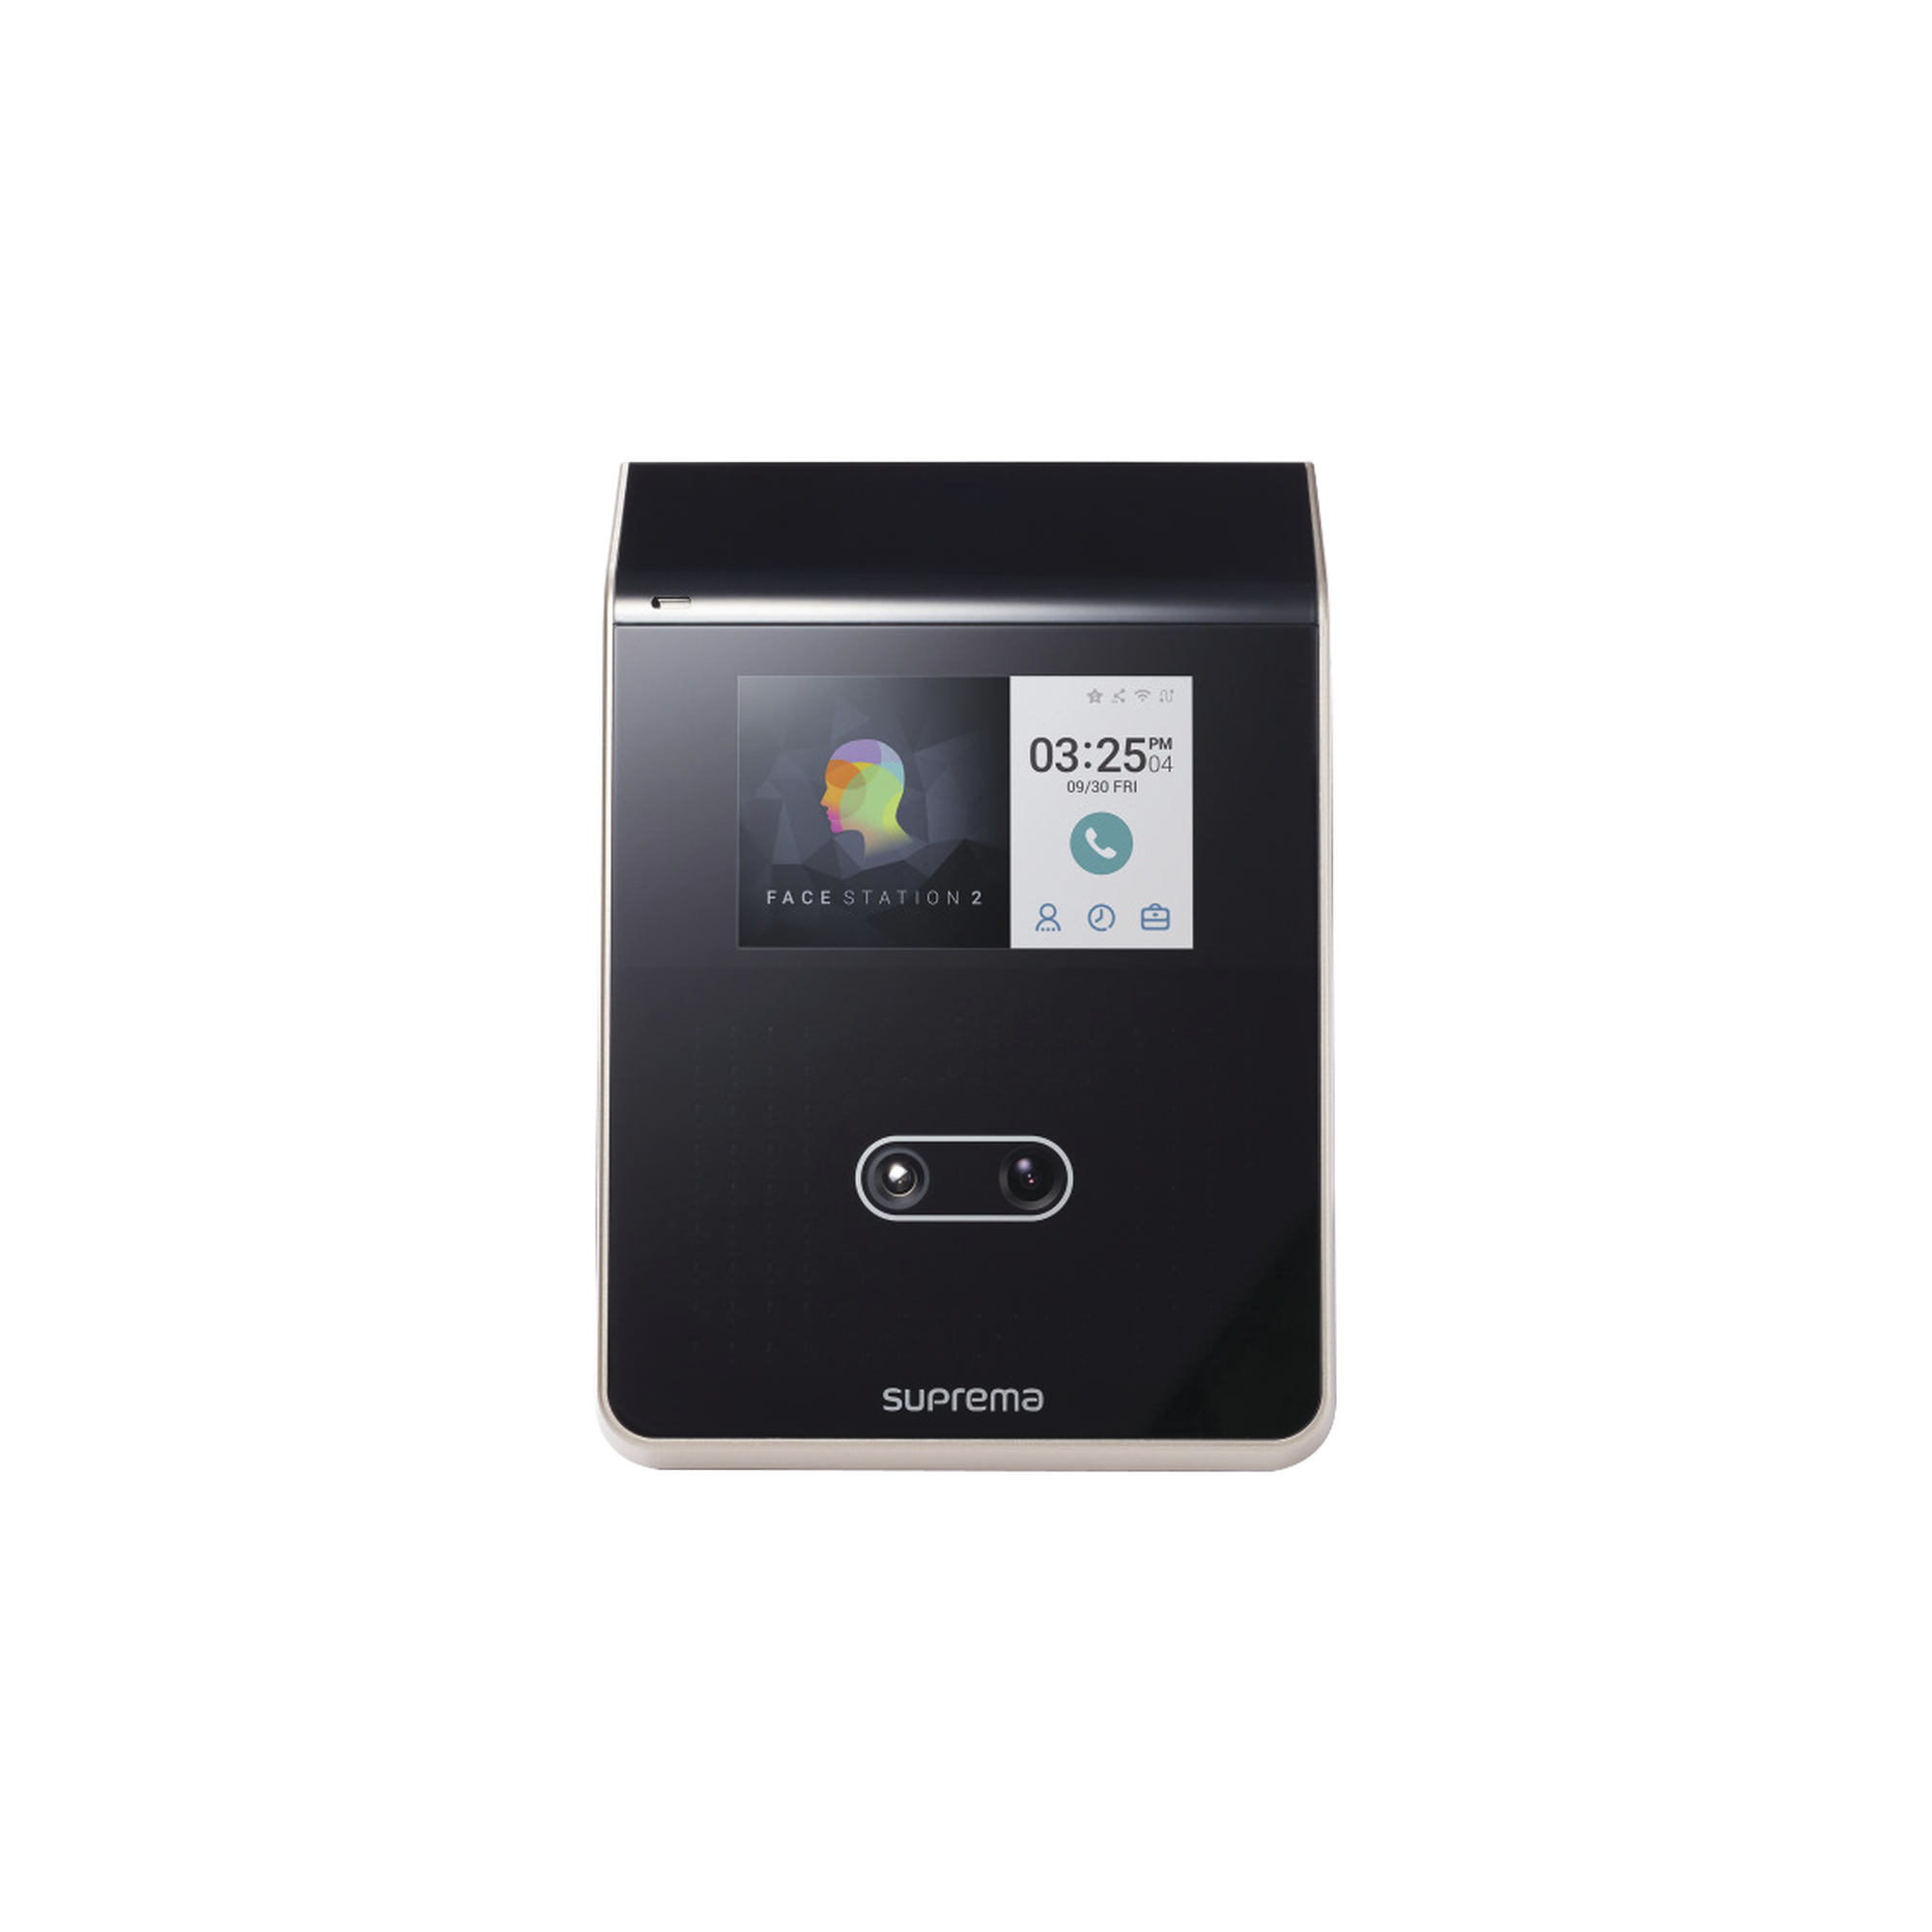 FaceStation 2 Lector Facial Bluetooth MultiClass SE Dual RFID (125KHZ EM HID PROX 13.56MHZ Mifare DesFire / EV1 FELICA ICLASS S) Compatible con BioStar2